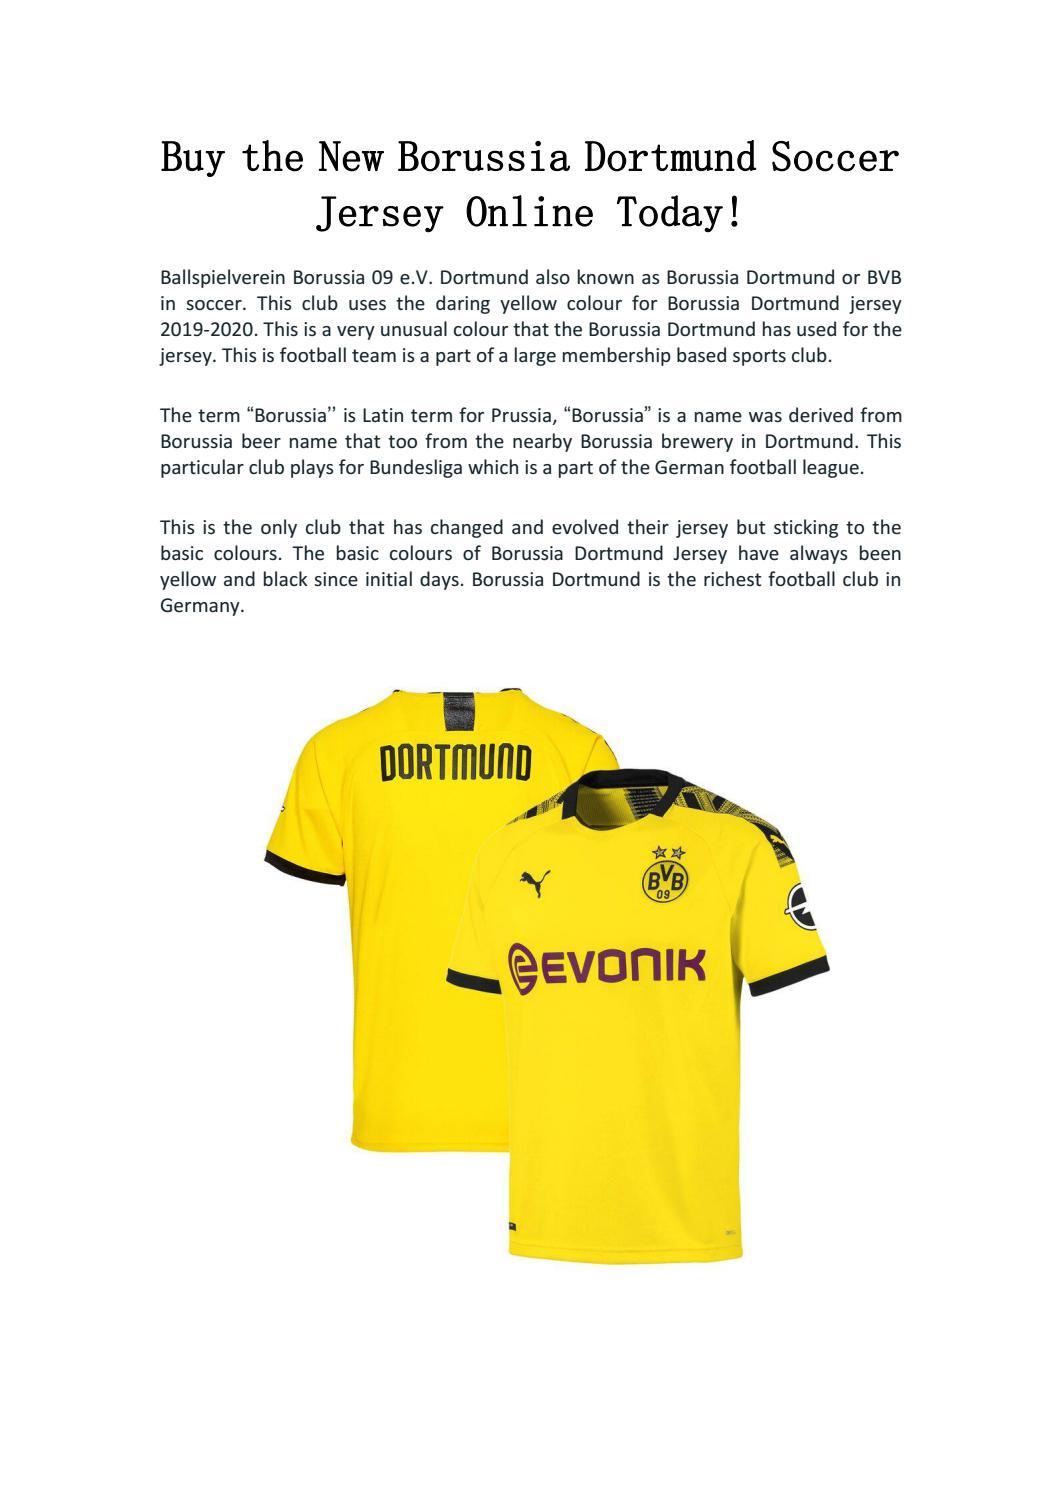 Buy The New Borussia Dortmund Soccer Jersey Online Today By Joseph E Keller Issuu